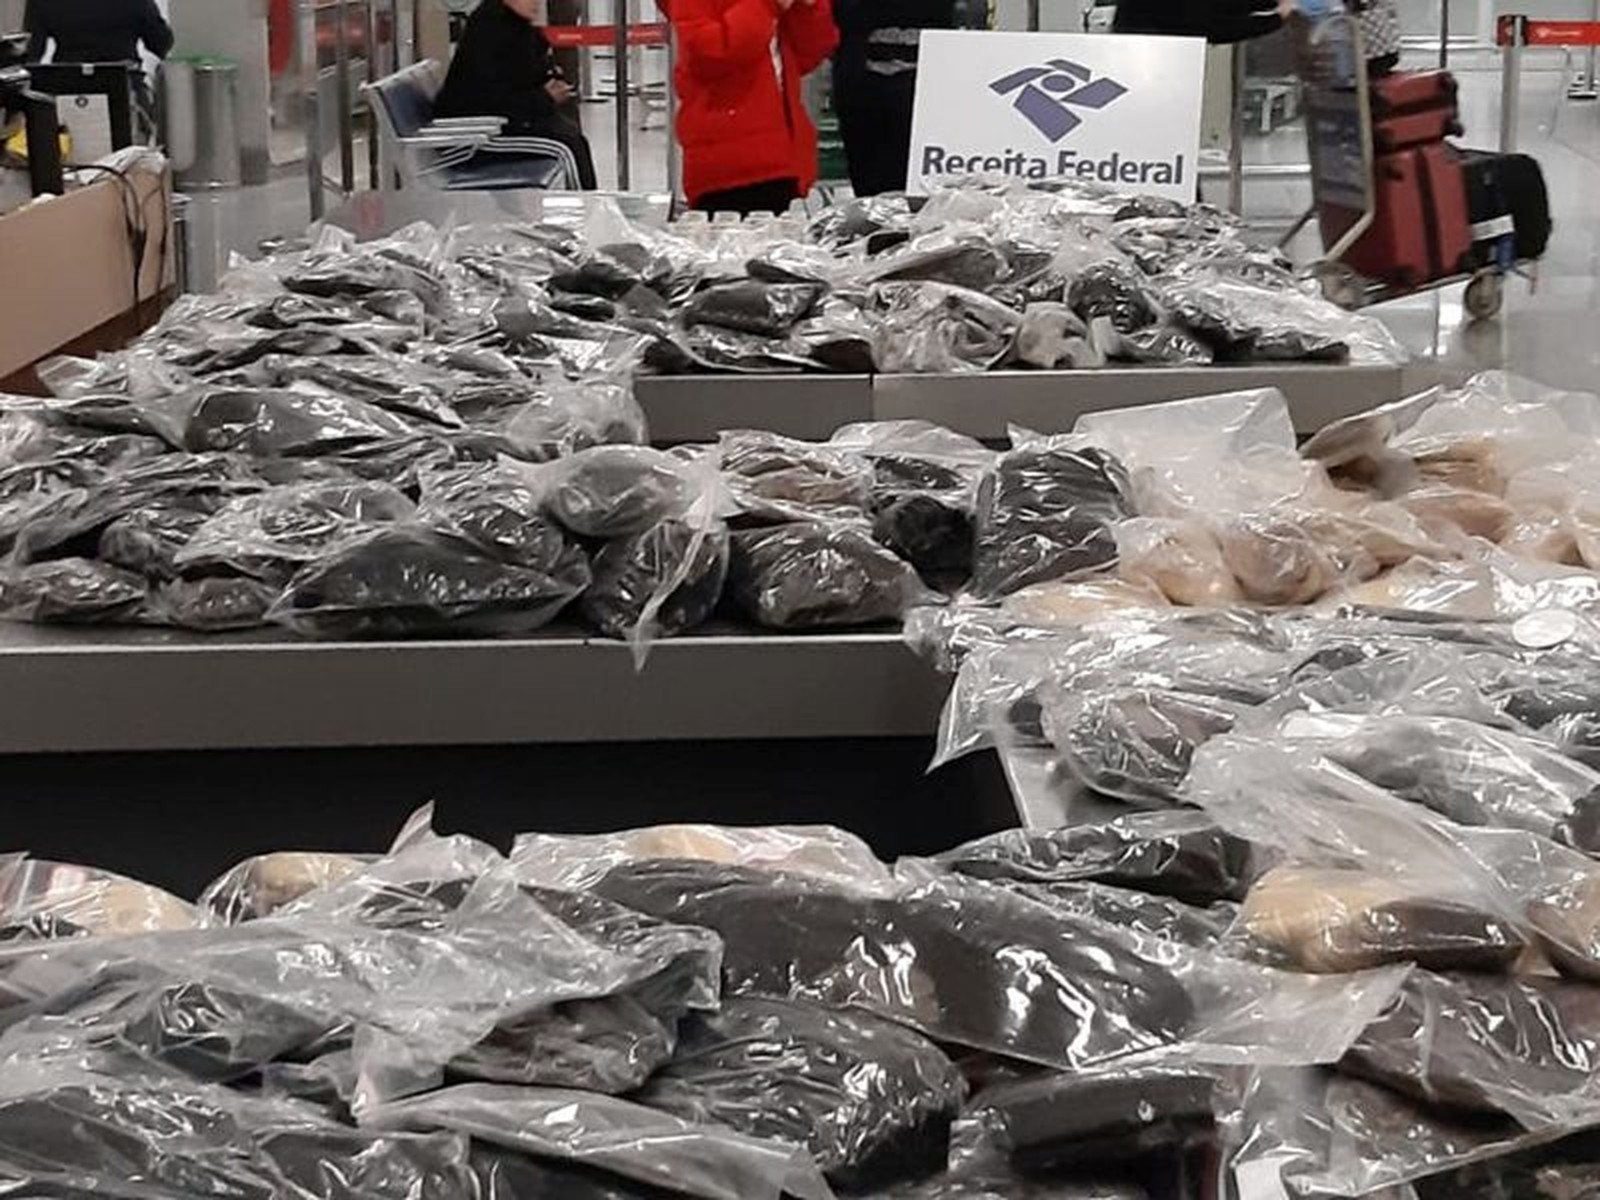 Receita Federal apreende 95 quilos de cabelo no Aeroporto do Galeão, Rio